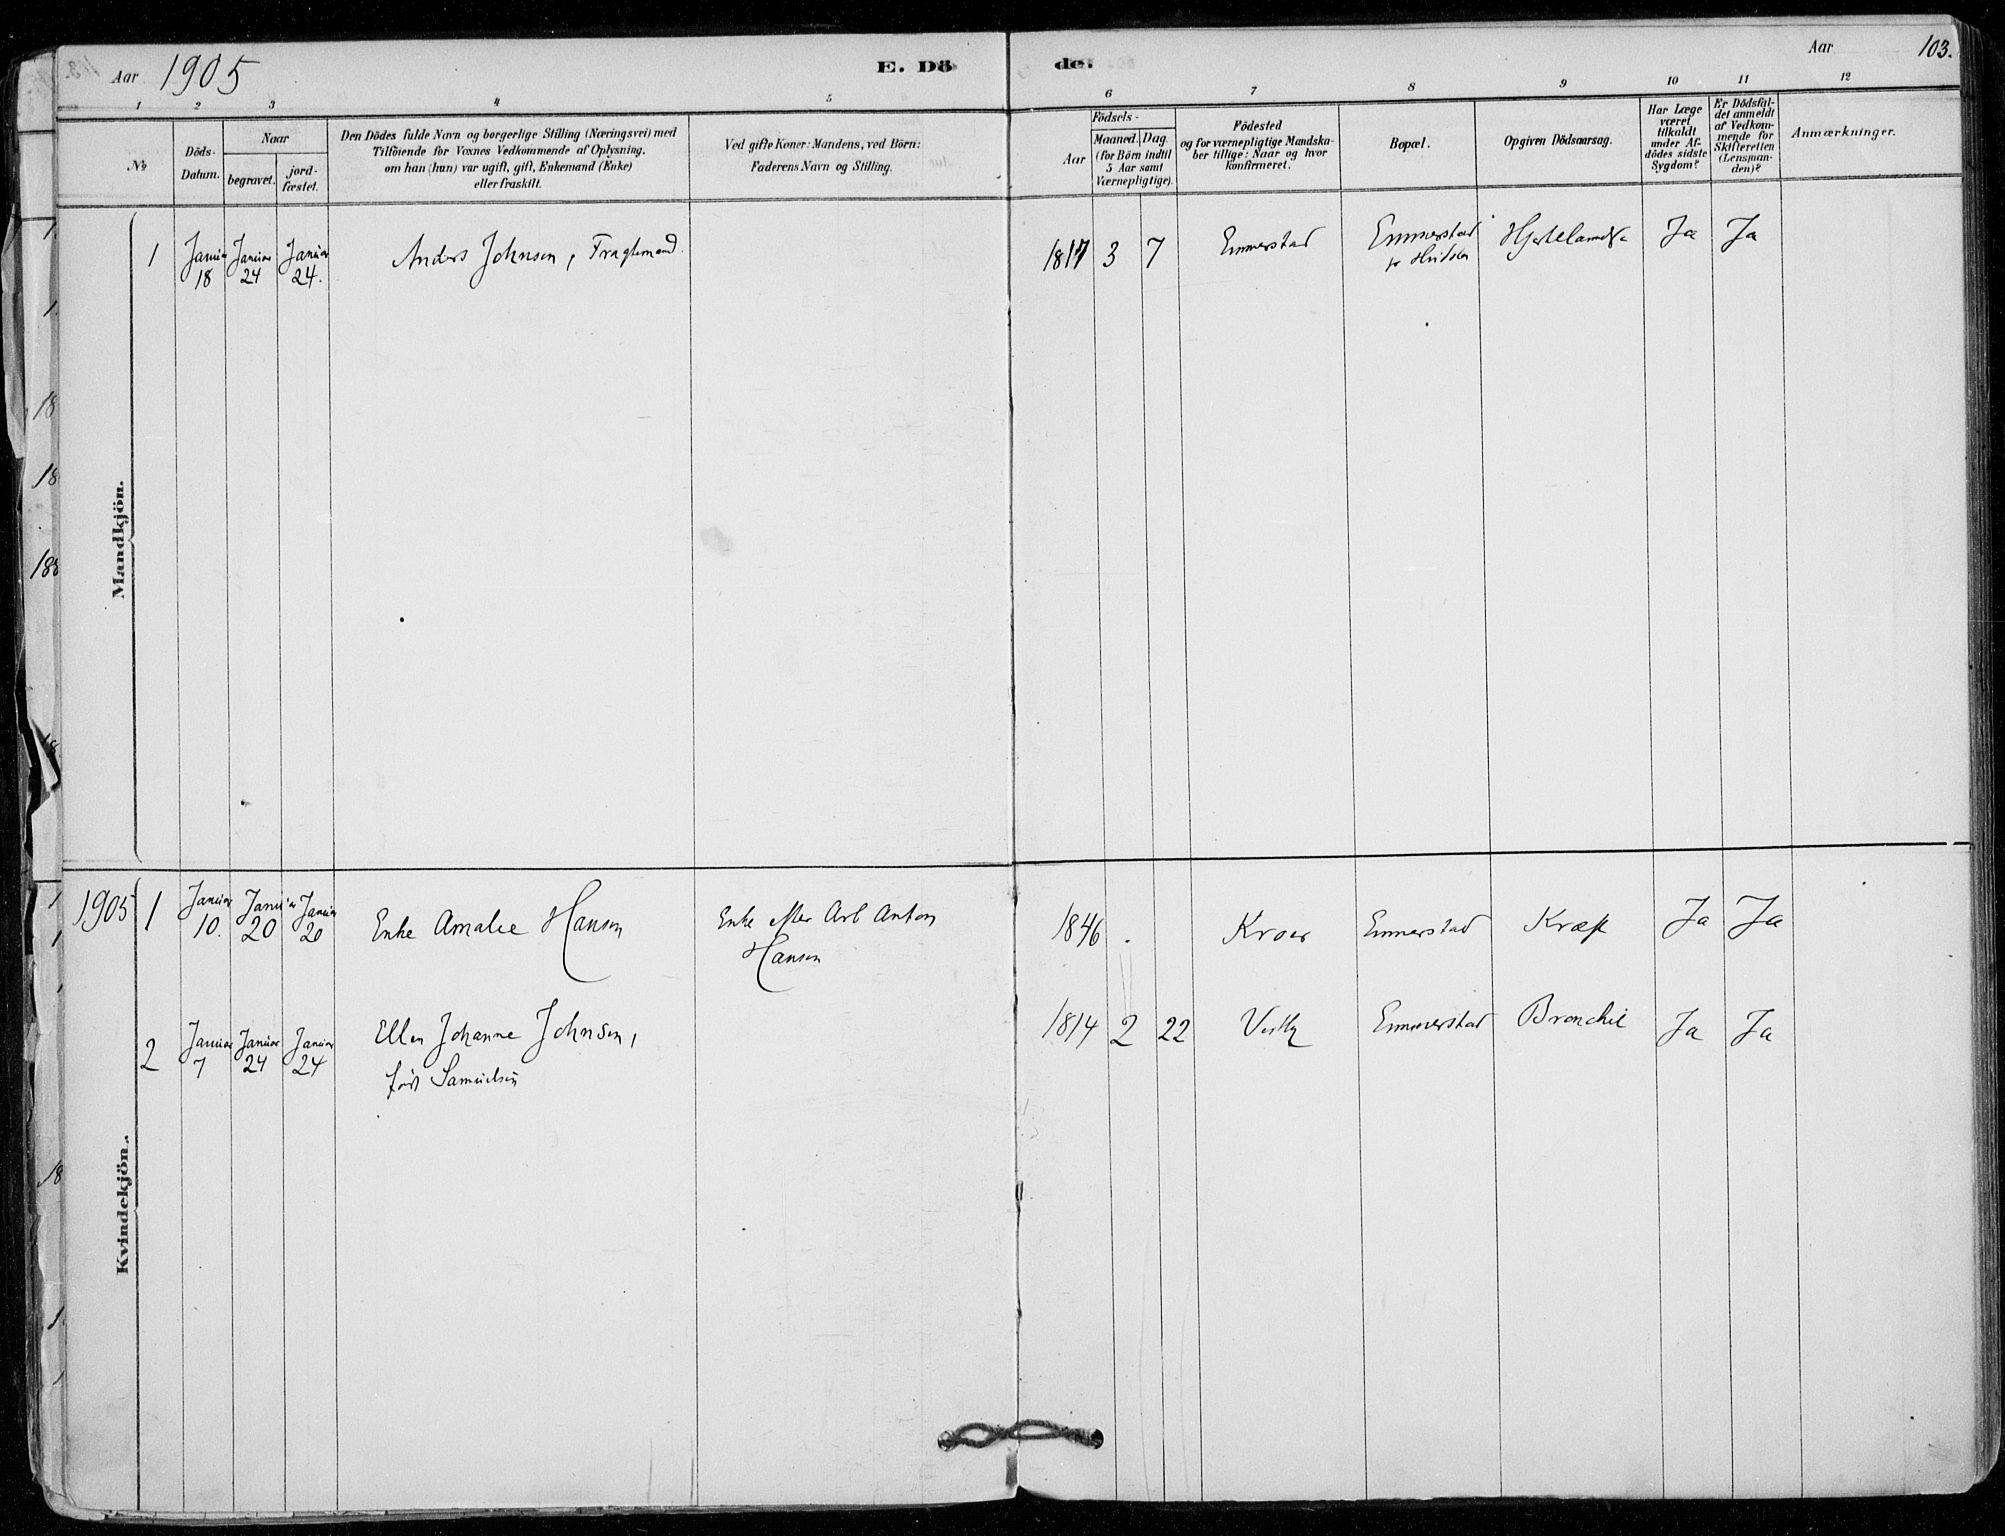 SAO, Vestby prestekontor Kirkebøker, F/Fd/L0001: Ministerialbok nr. IV 1, 1878-1945, s. 103